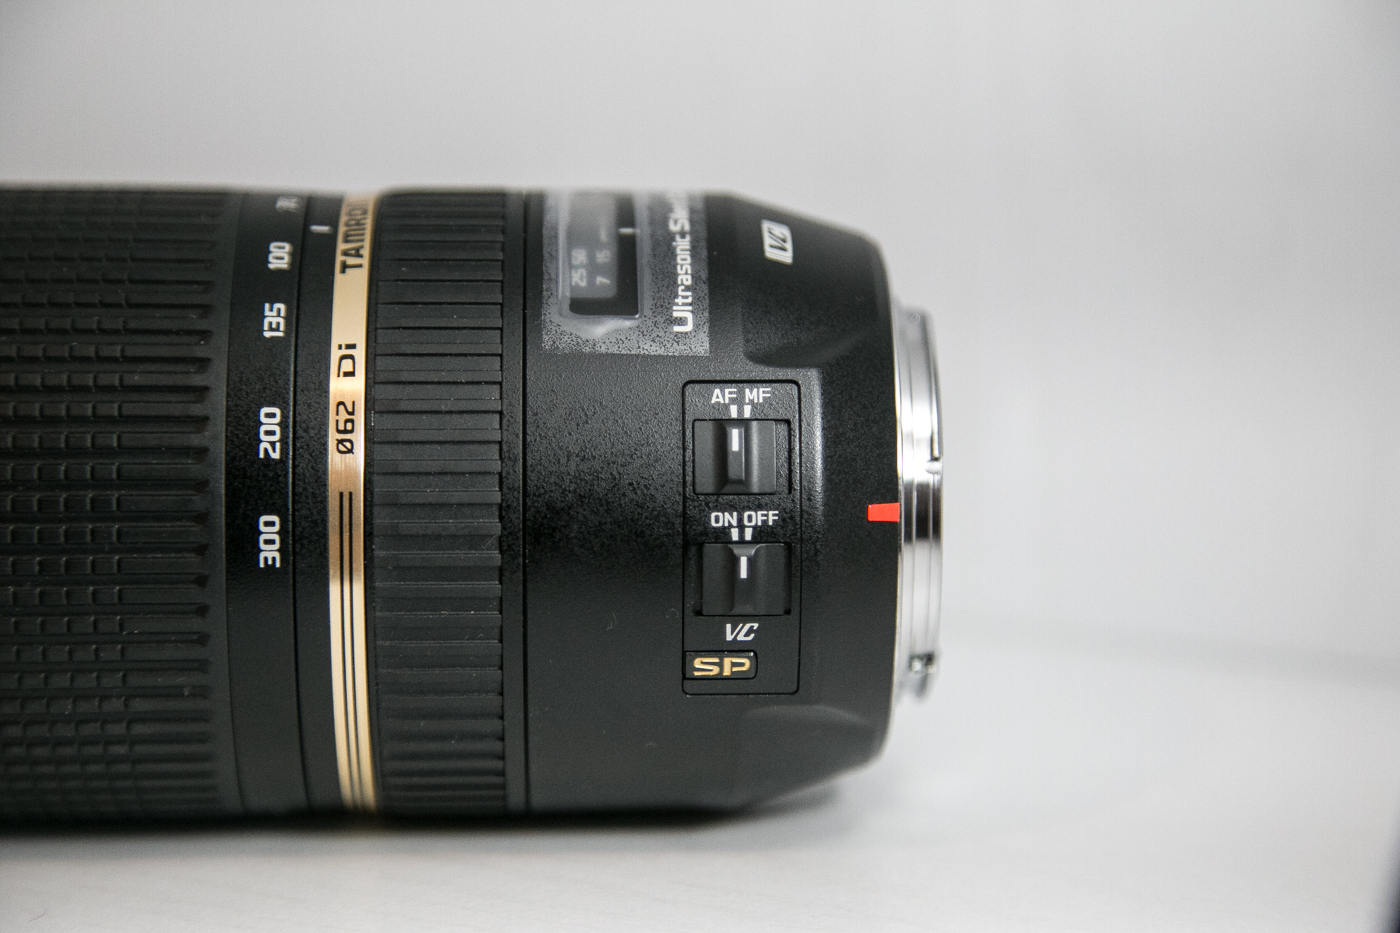 IMG_1470-1.jpg